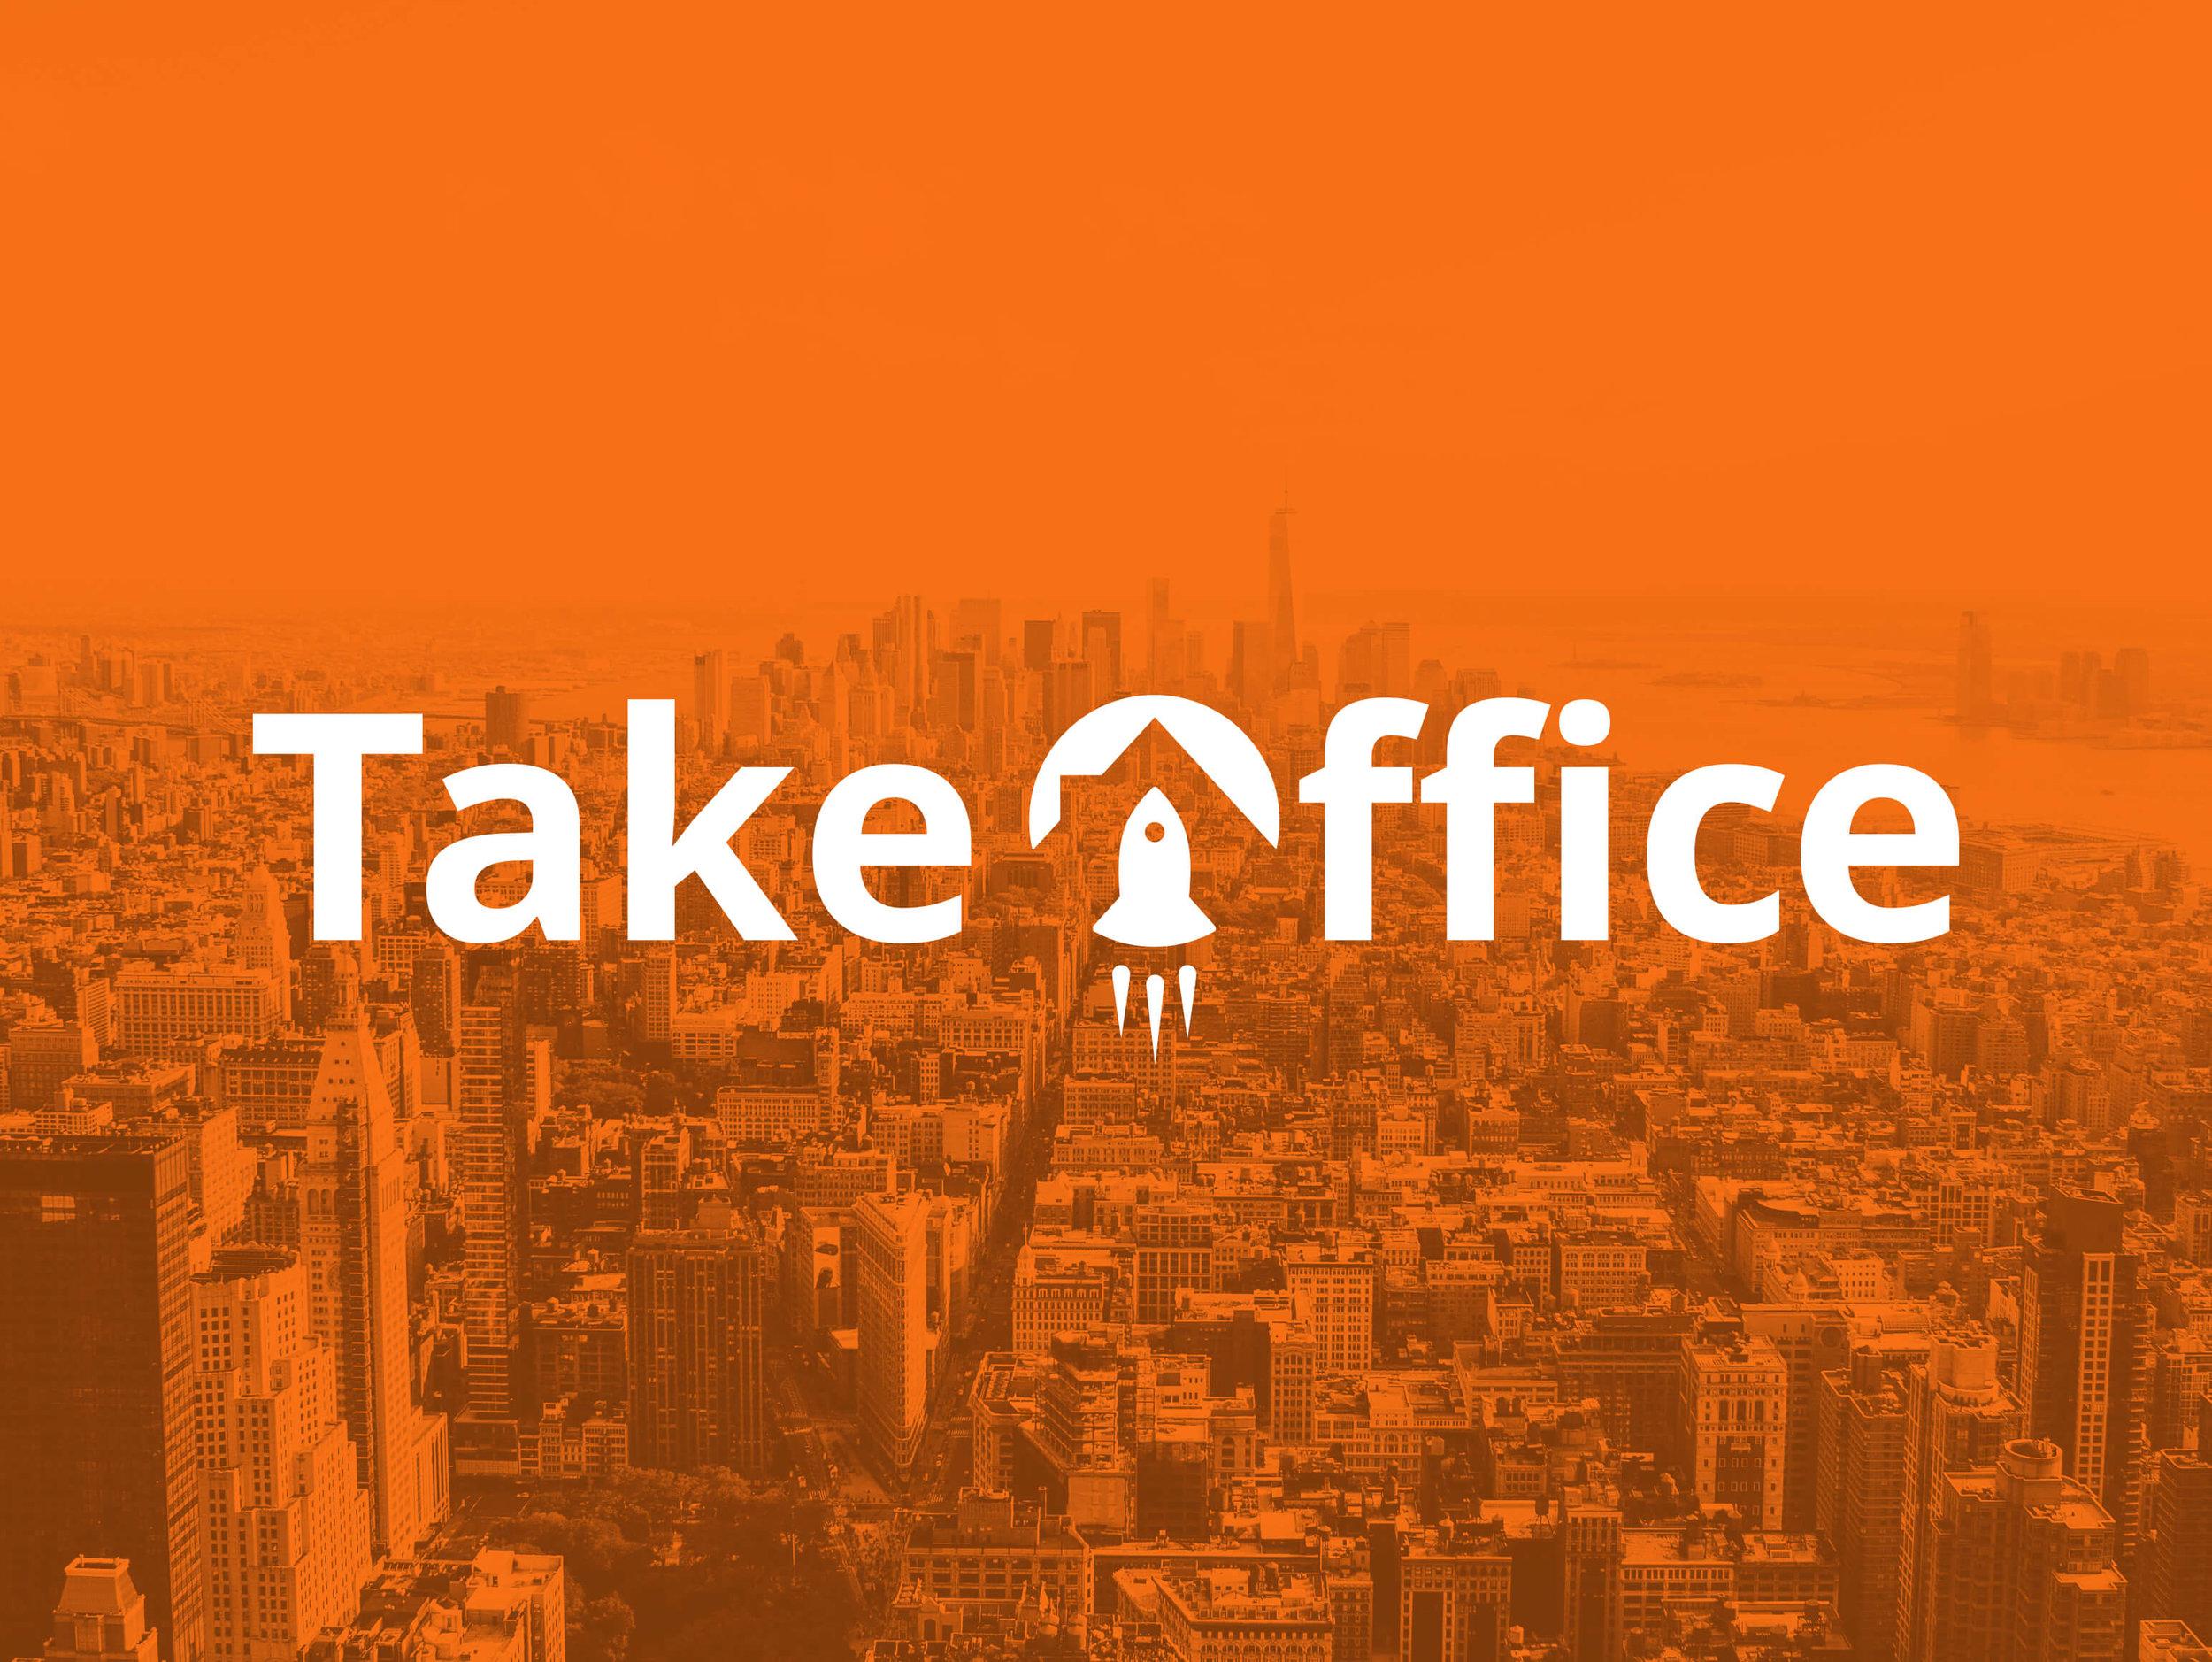 TakeOffice-Thumb.jpg